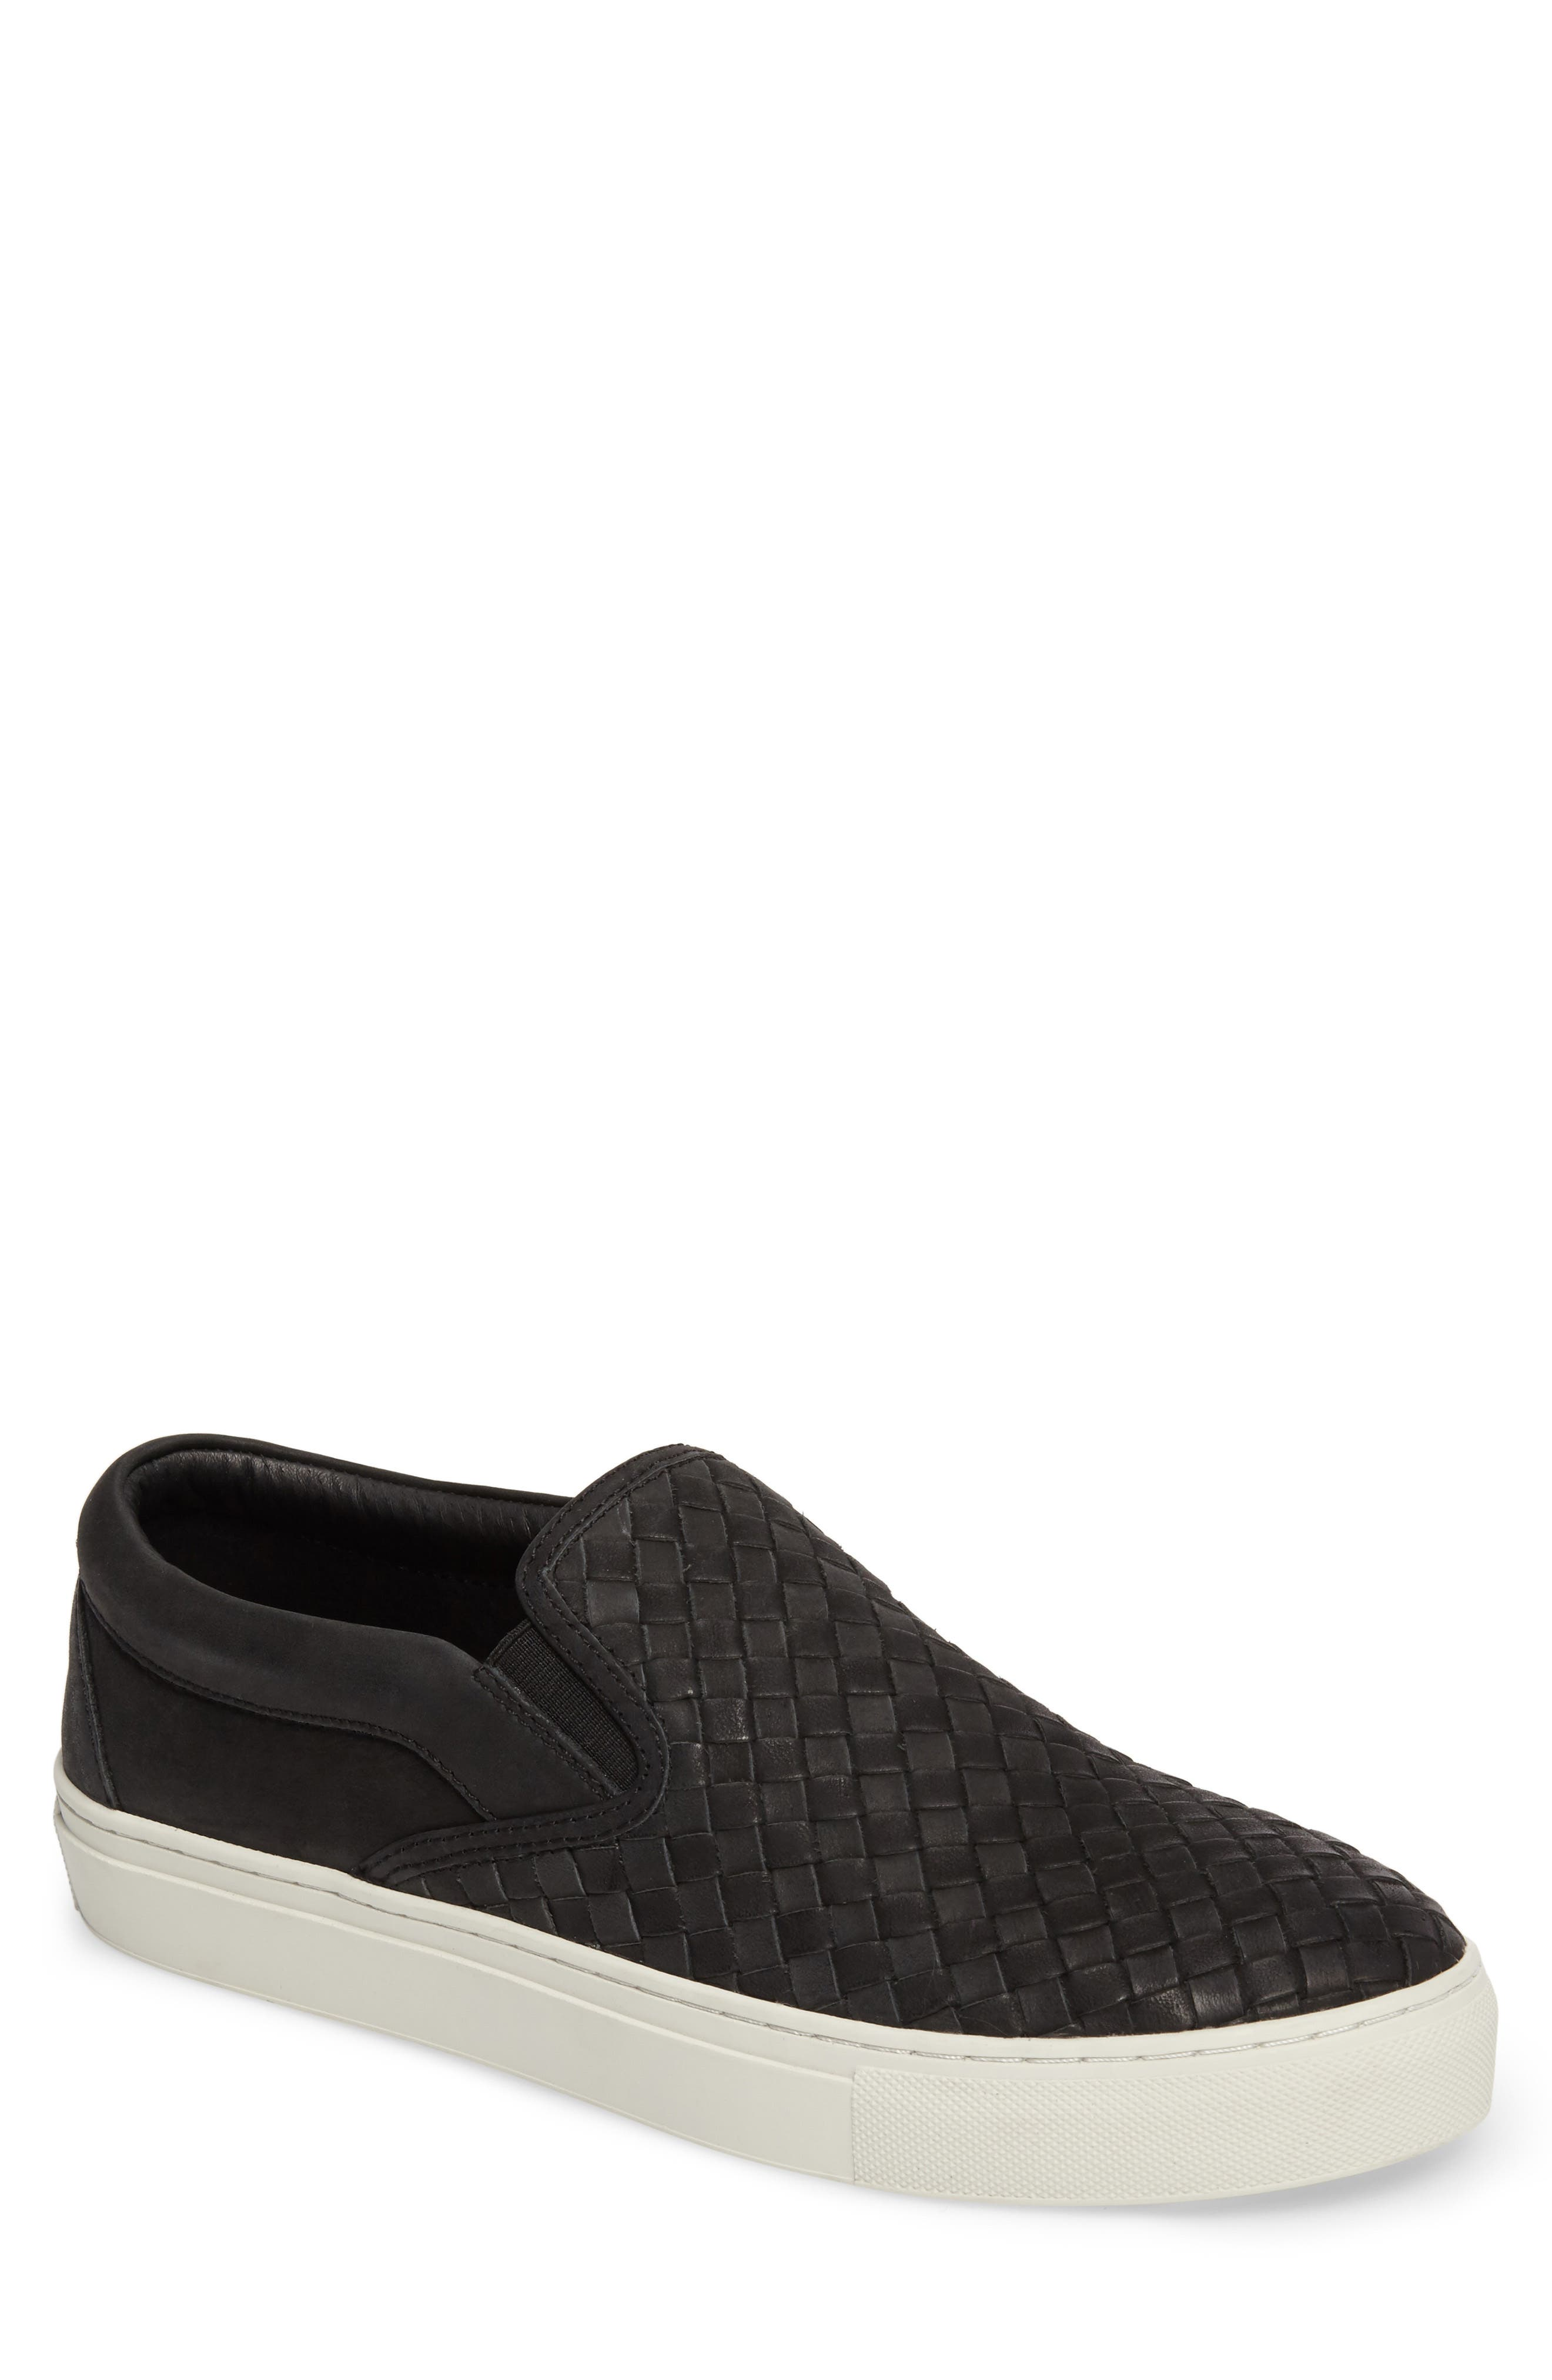 Dawson Slip-On,                         Main,                         color, Black Leather